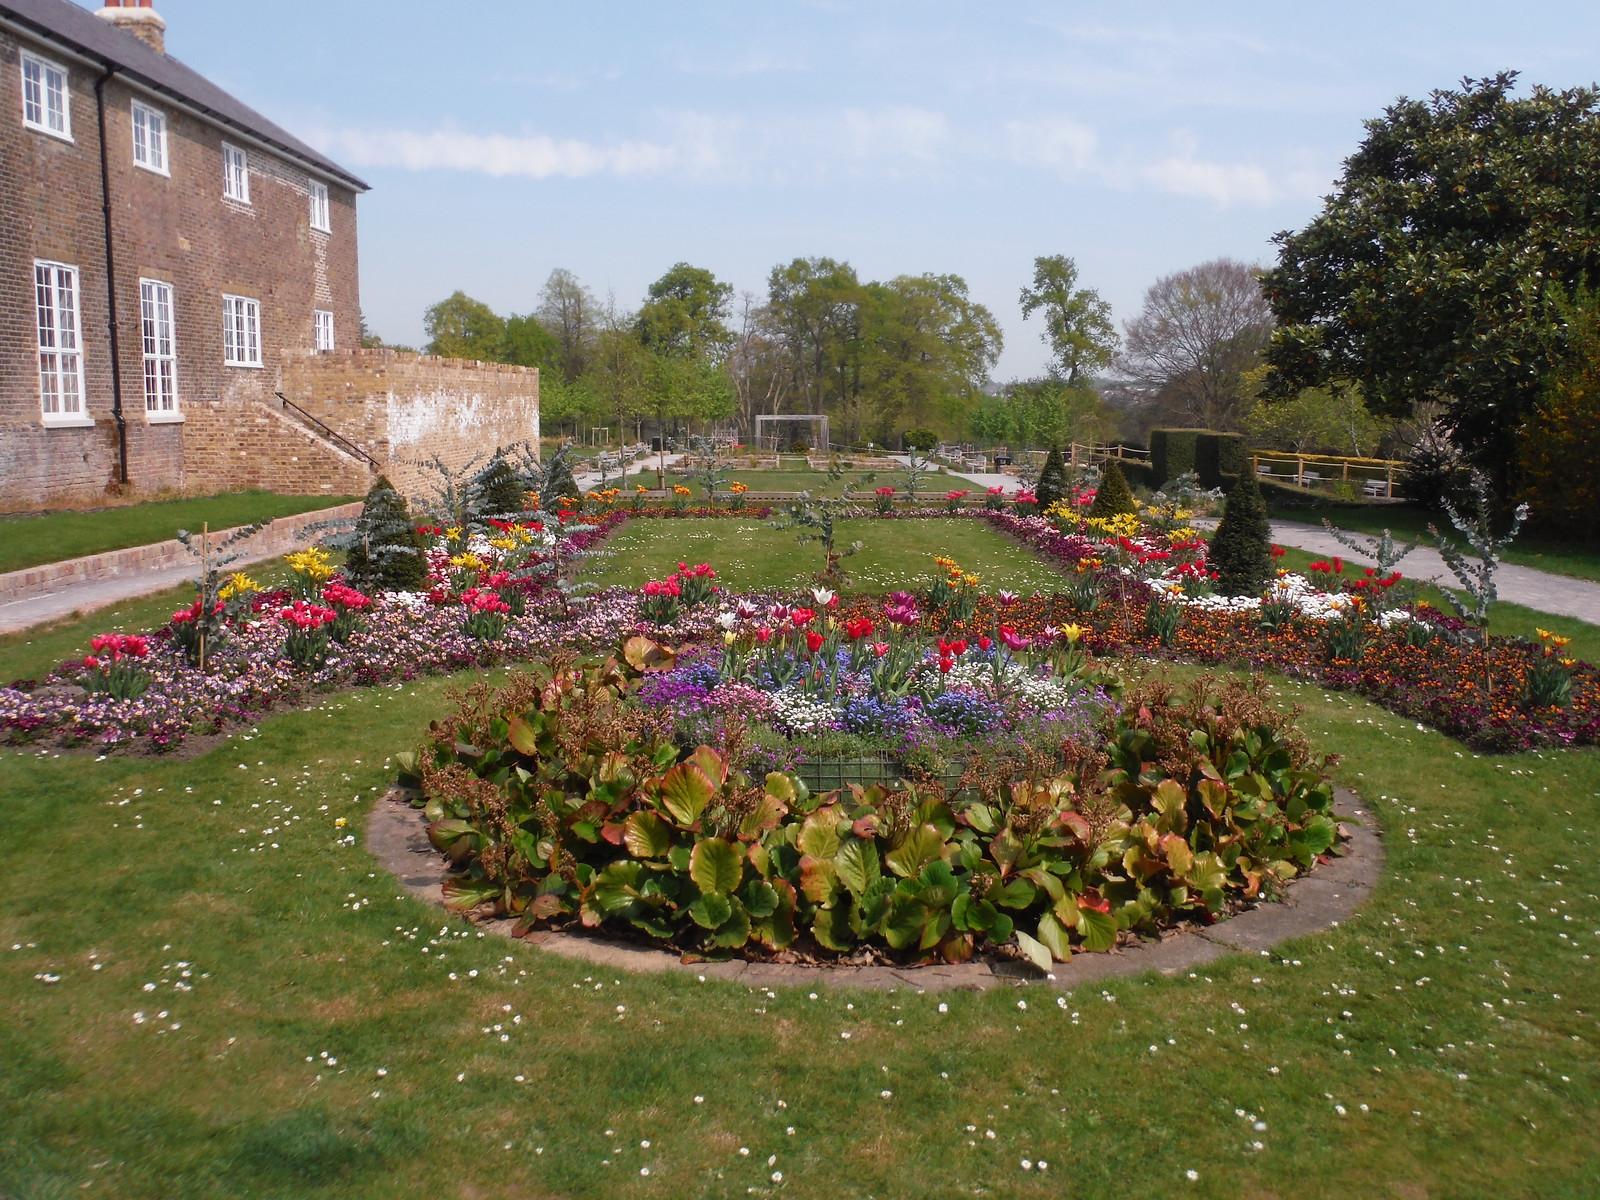 Ornamental Gardens SWC Short Walk 46 - Beckenham Place Park (Ravensbourne to Beckenham Hill)